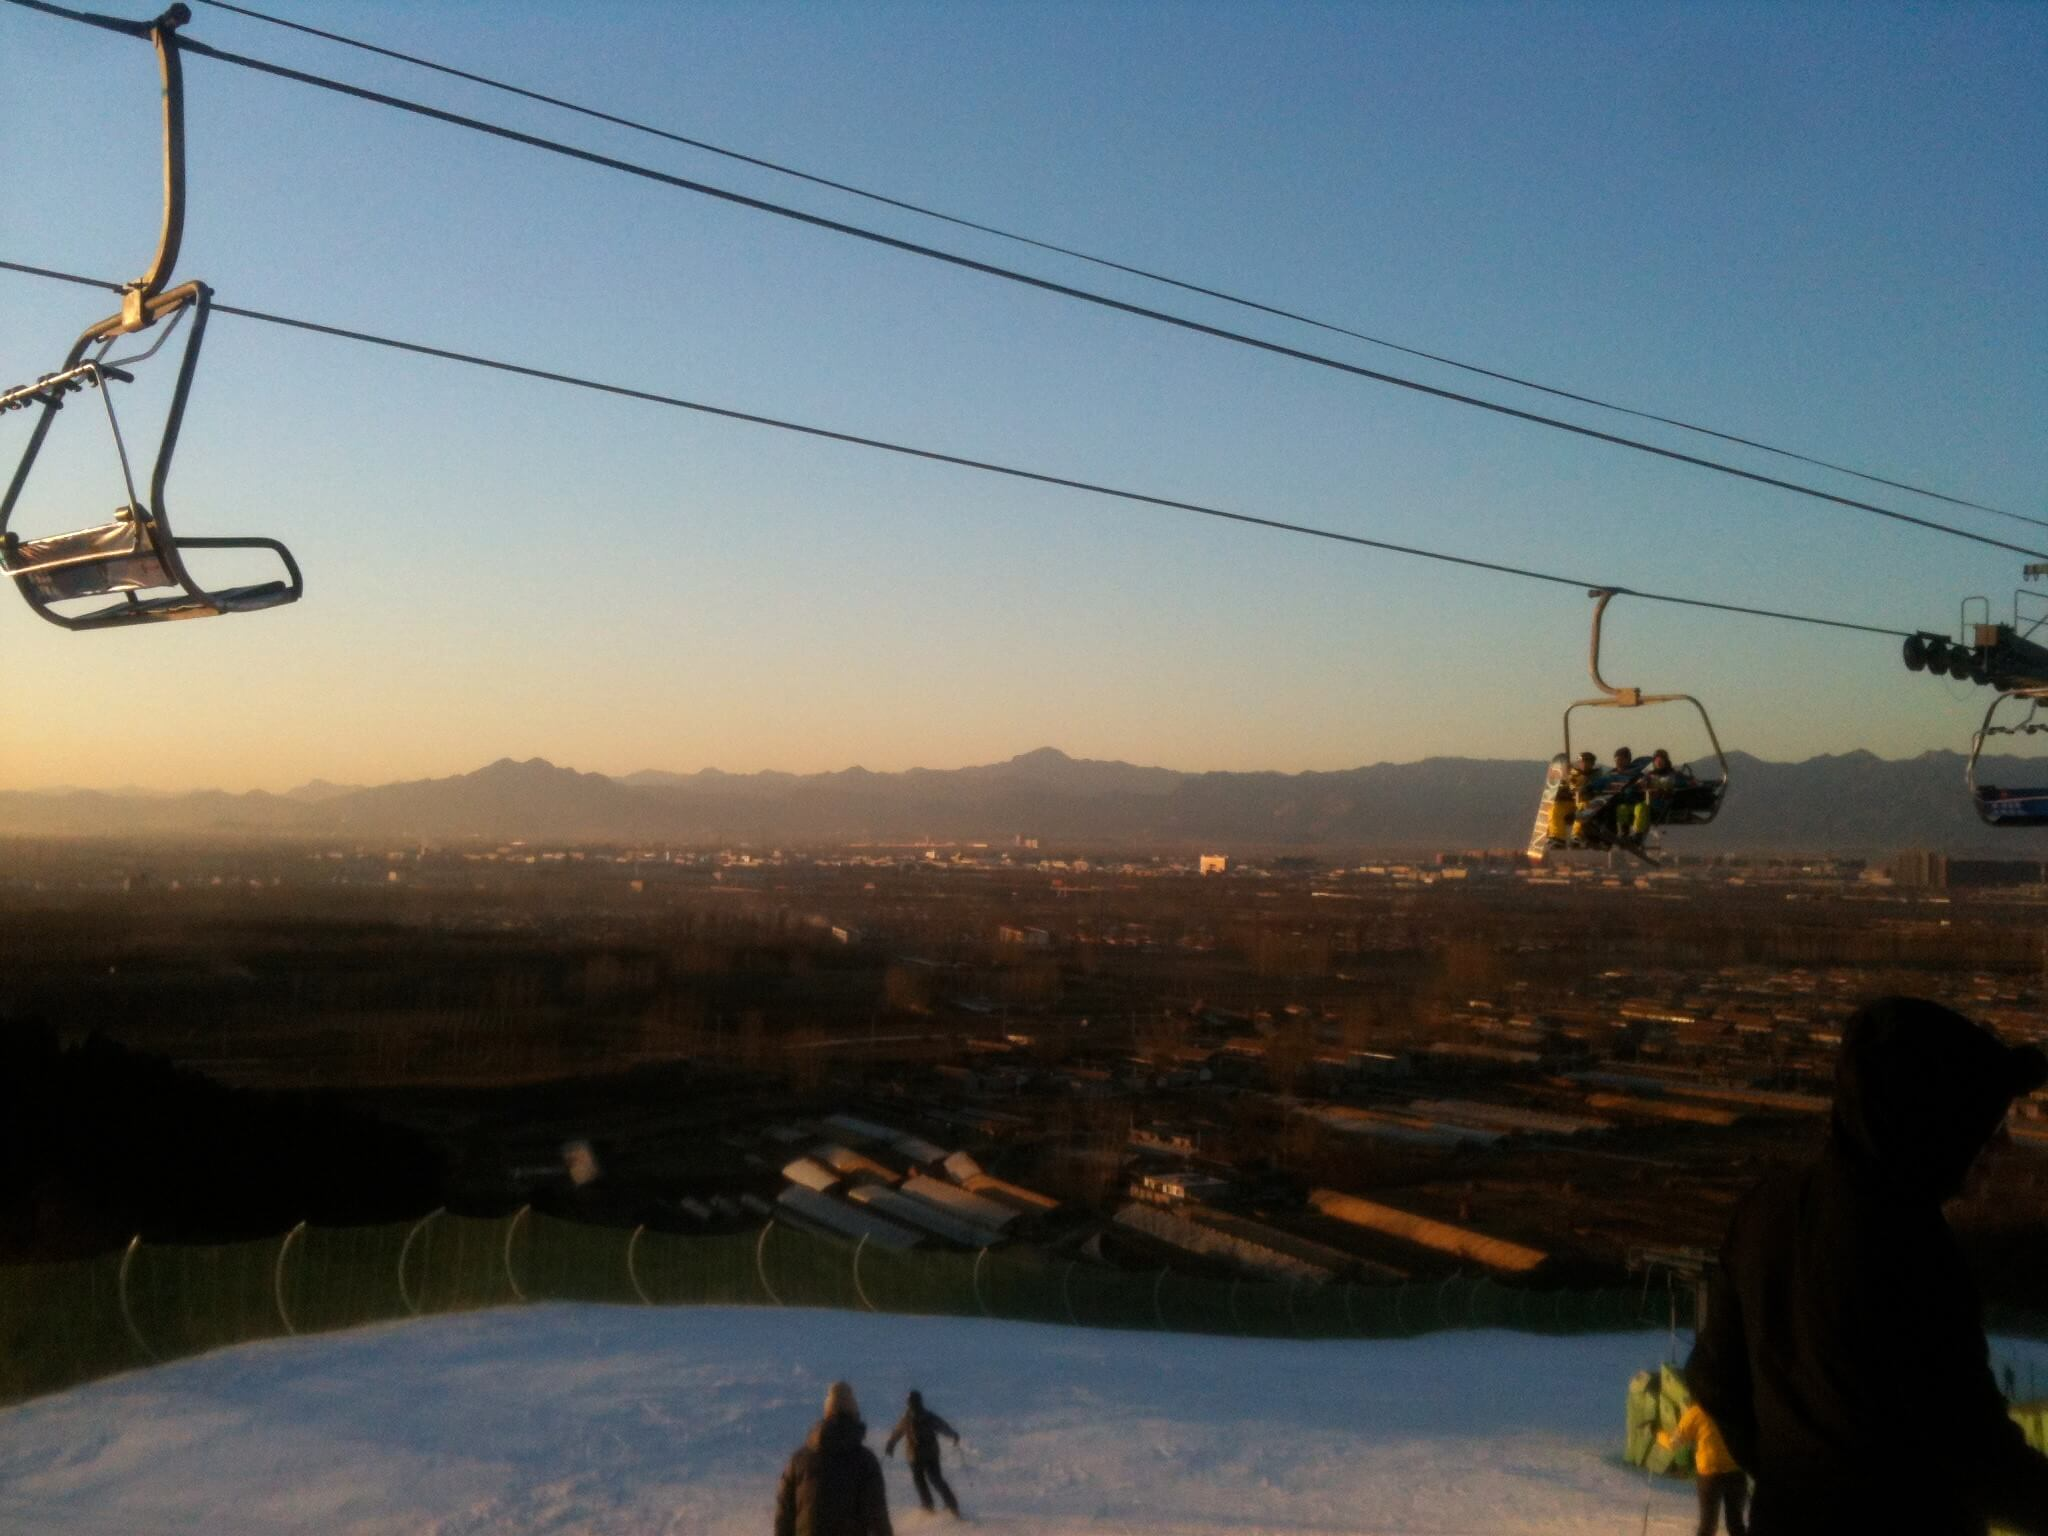 Skiing at Nanshan